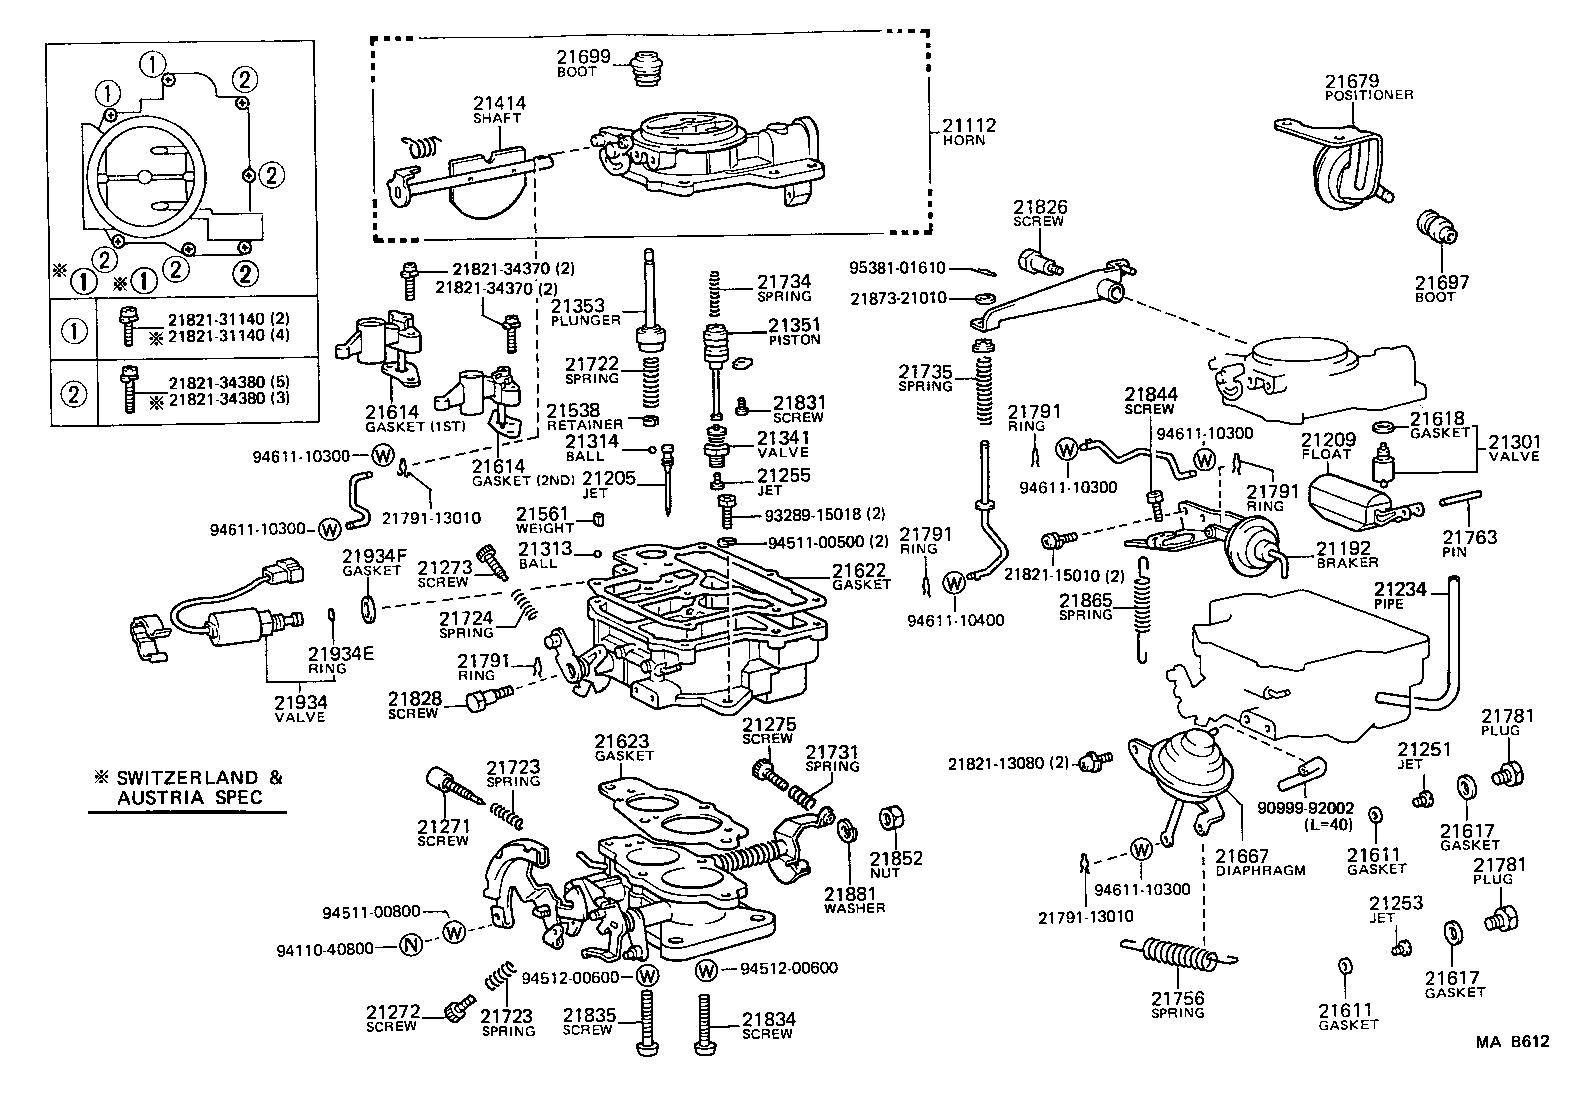 1989 Toyota Van Engine Diagram Wiring Diagram View A View A Zaafran It